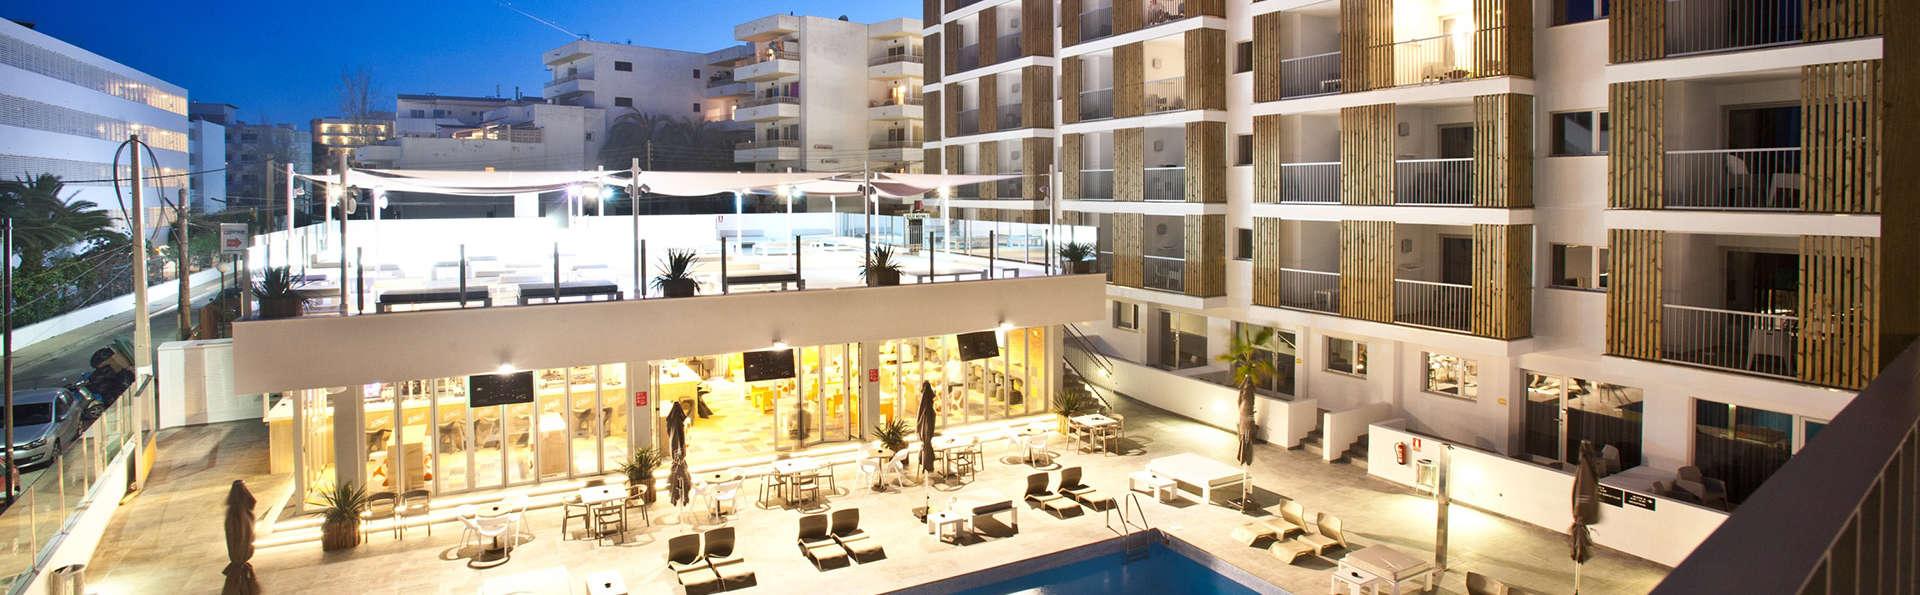 Ryans Ibiza (Only Adults) - Edit_view.jpg